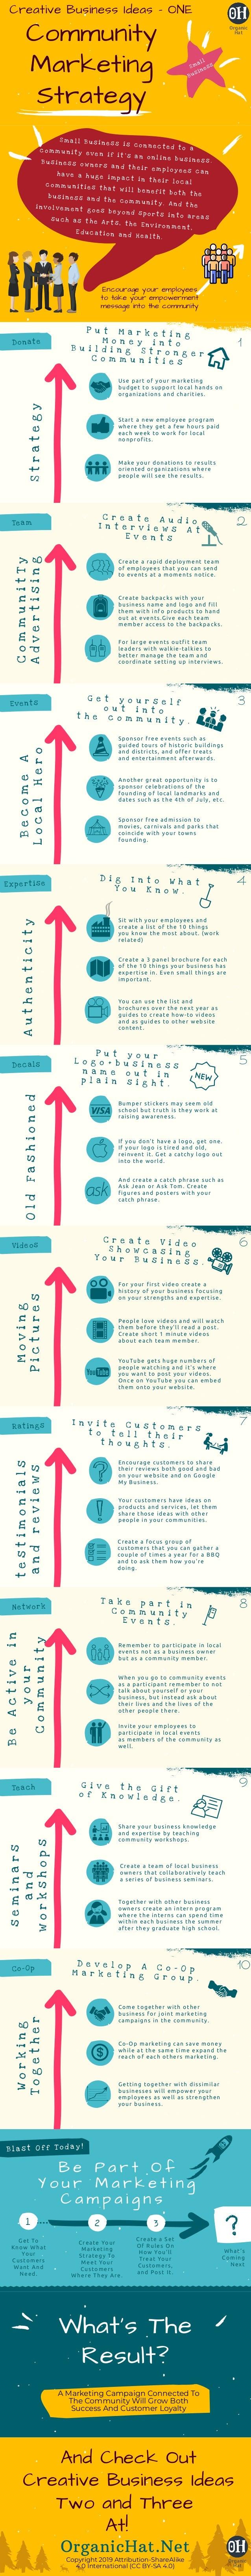 Creative Business Ideas - ONE Small Business Community Marketing Strategy Organic Hat S m a l l B u s i n e s s i s c o n ...